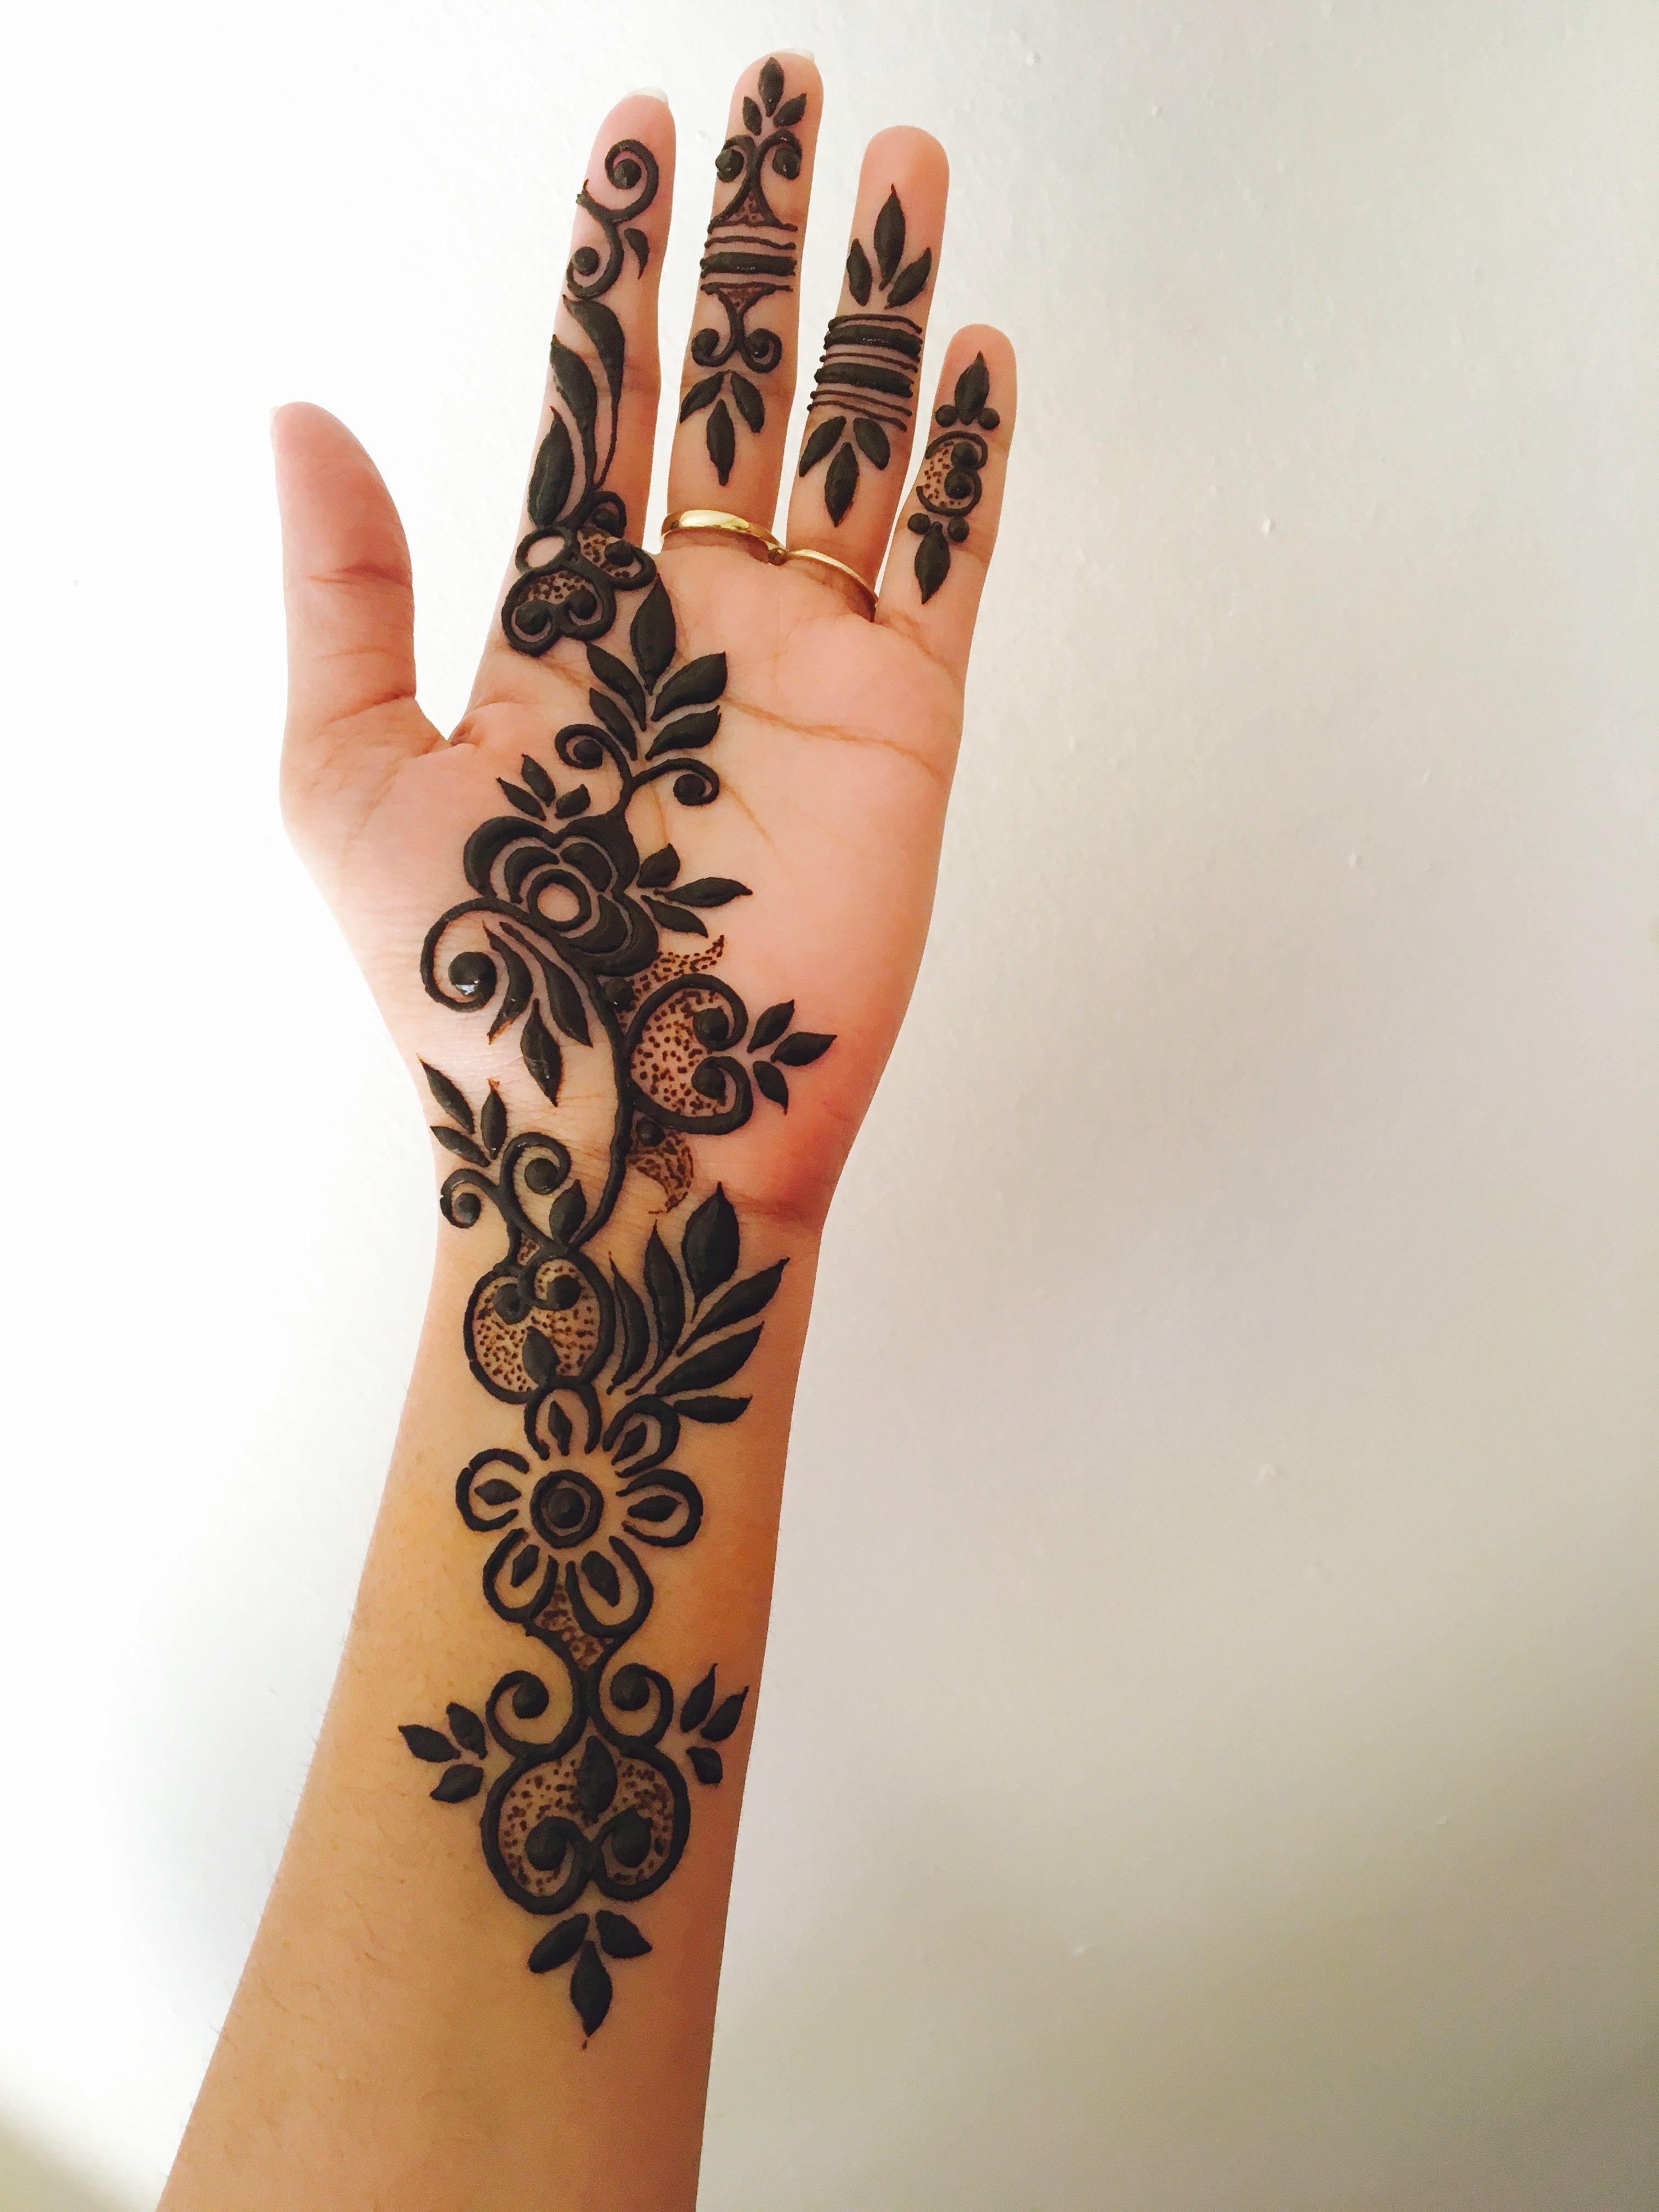 Khaleeji Henna Designs Tattoo: Mehndi Designs For Fingers, Latest